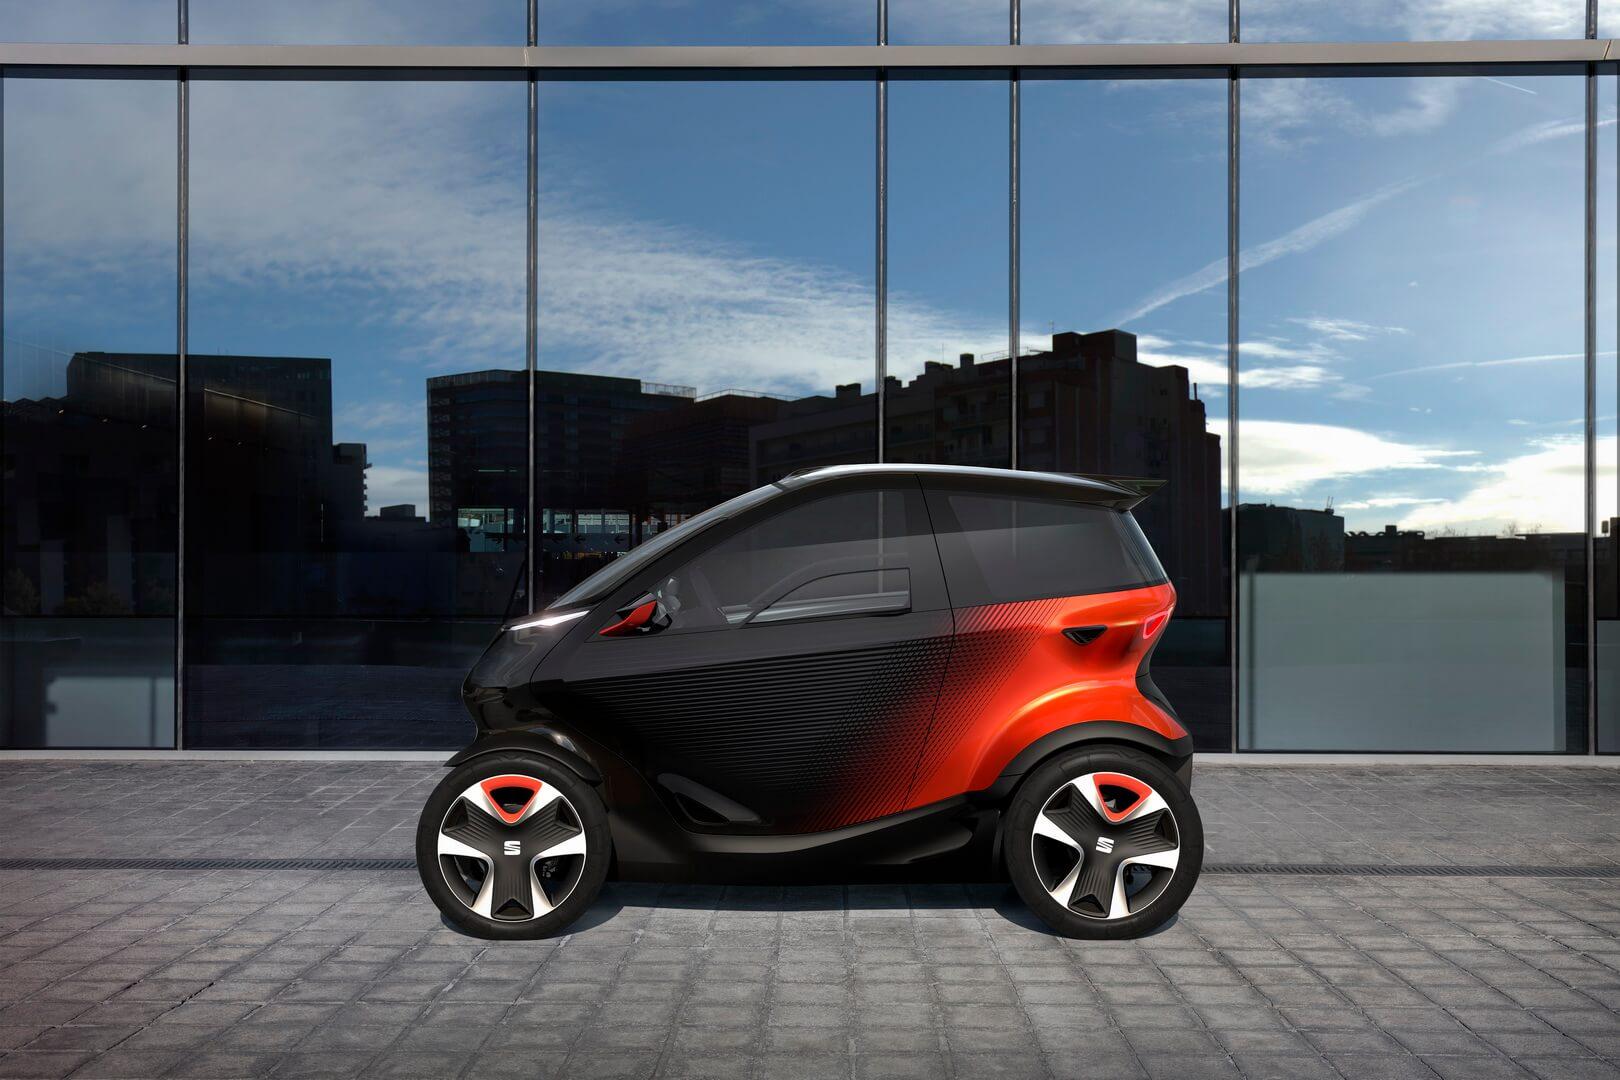 SEAT Minimó: электроконцепт симбиоза автомобиля имотоцикла